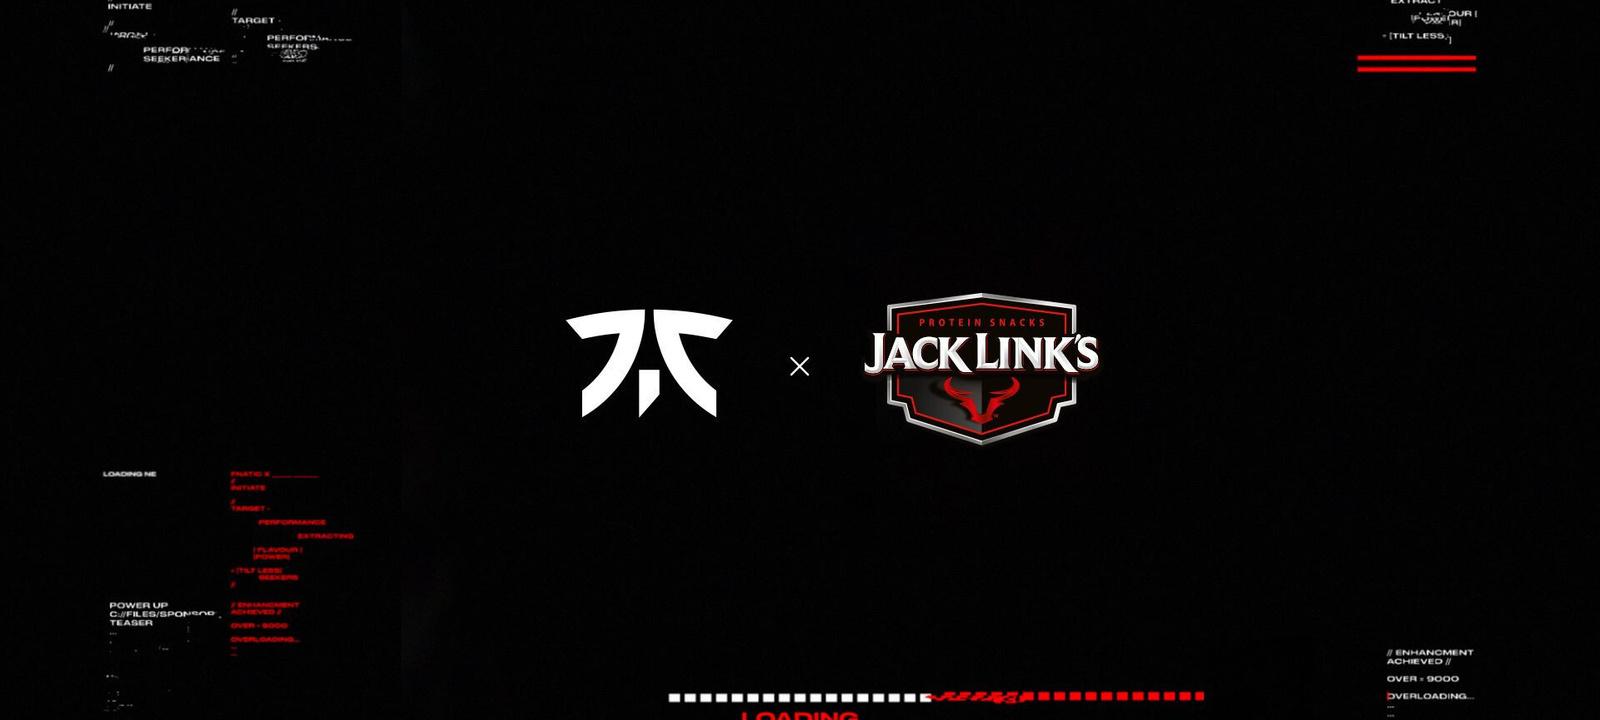 Fnatic x Jack Link's